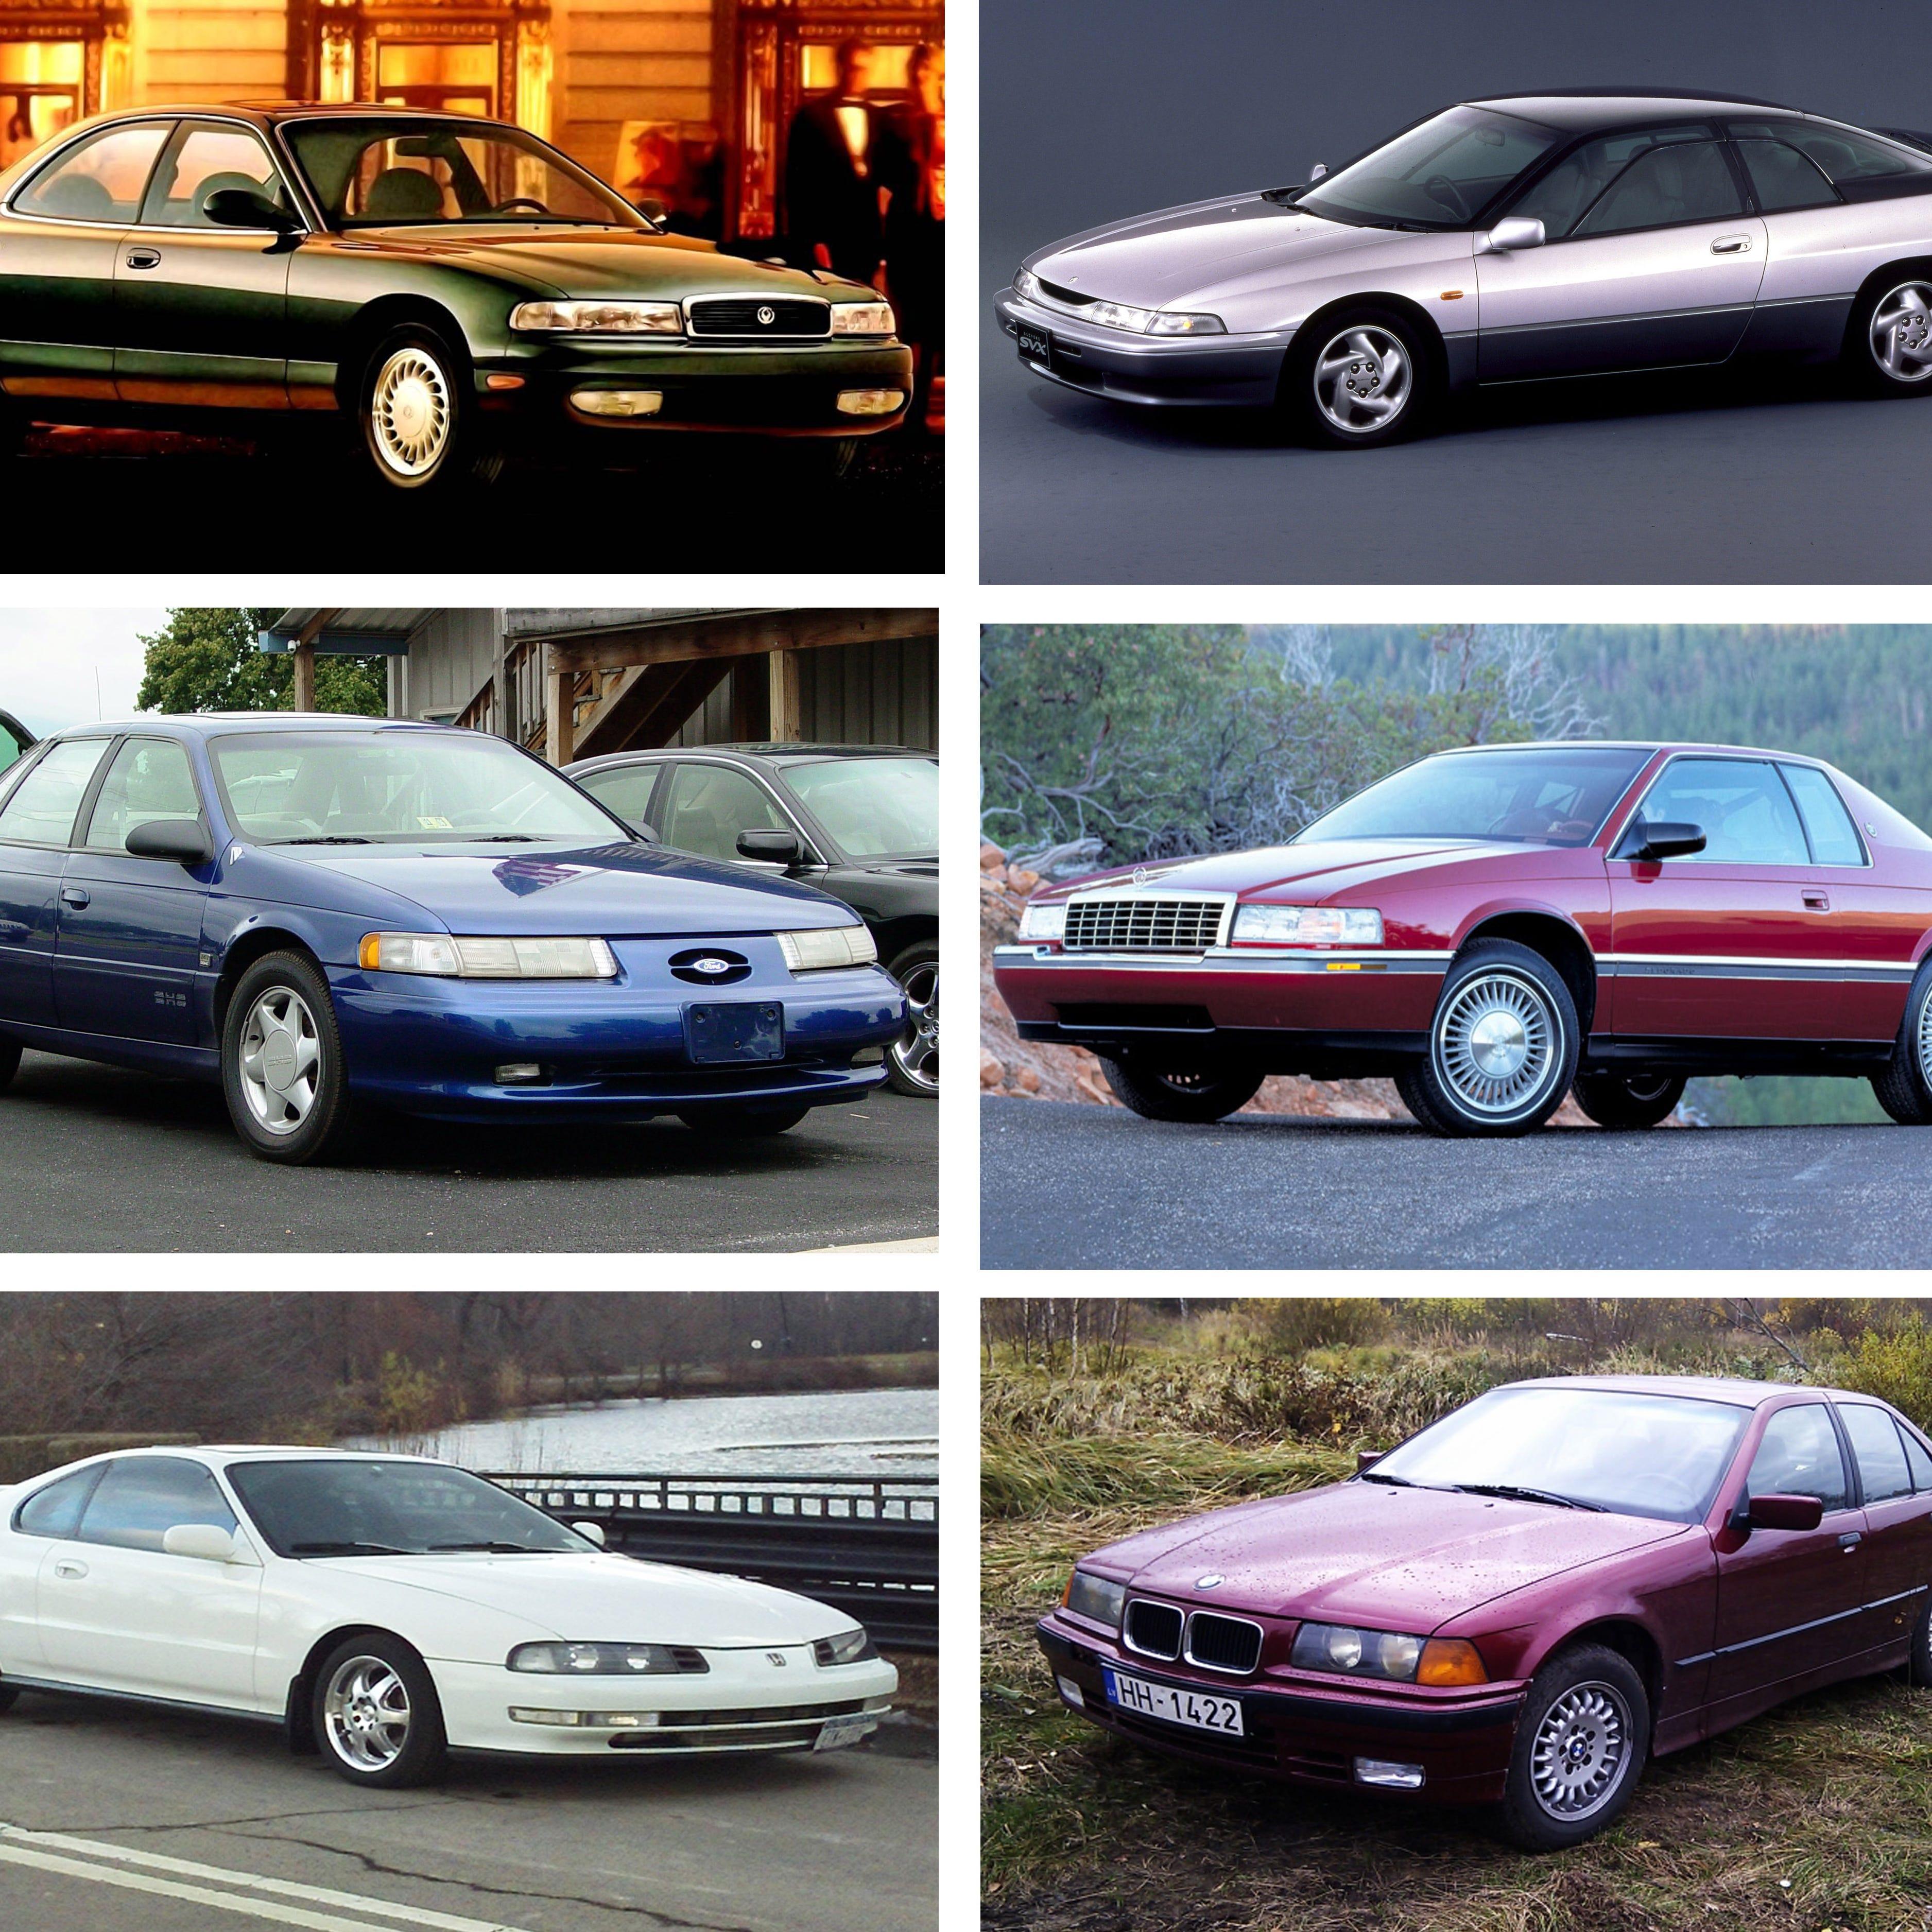 Meet the Dream Cruise Class of '92